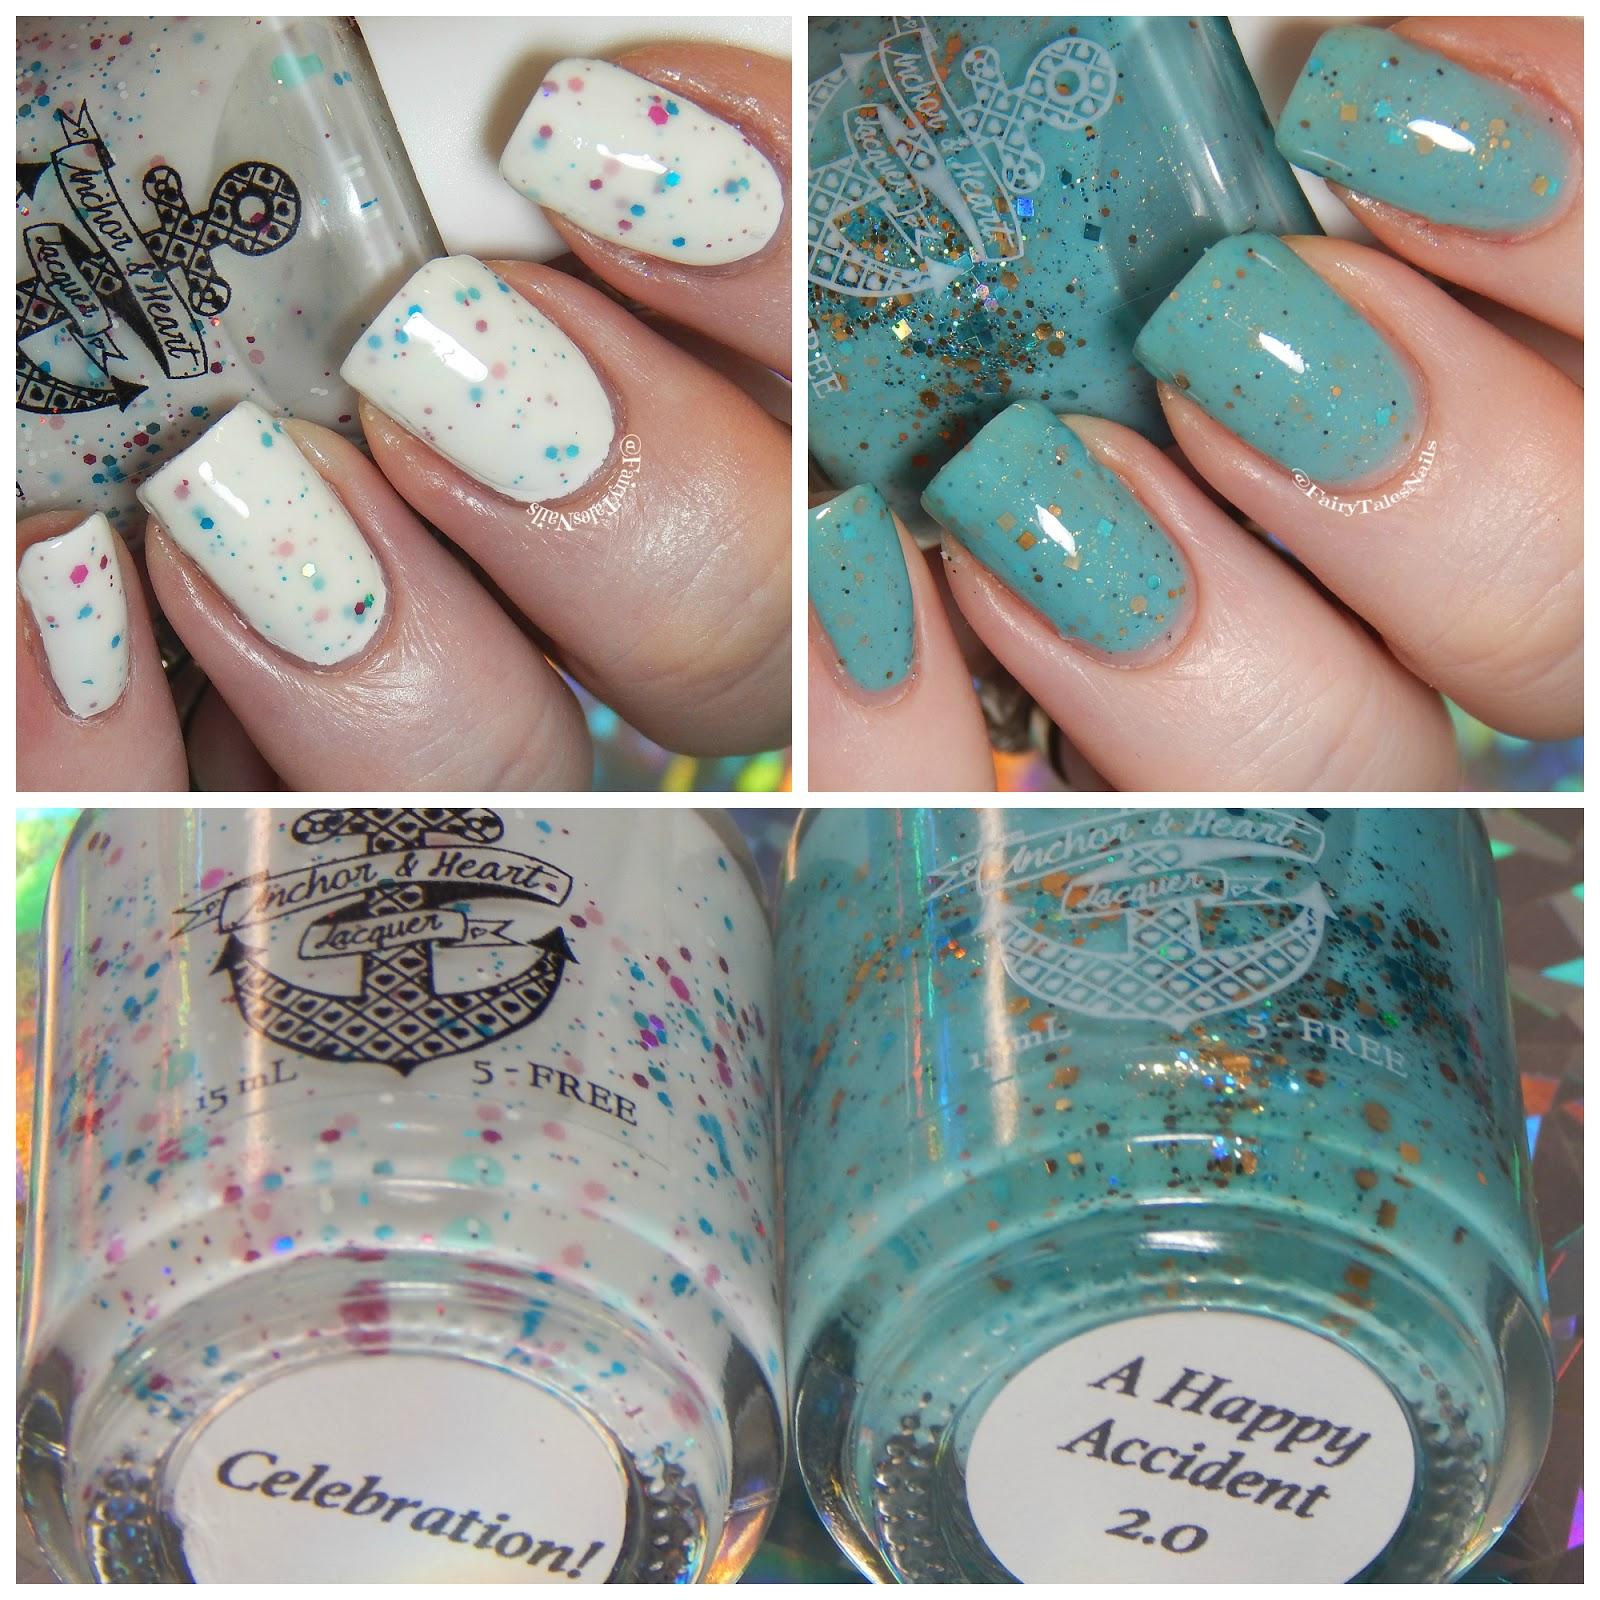 FairyTales Nails: February 2017